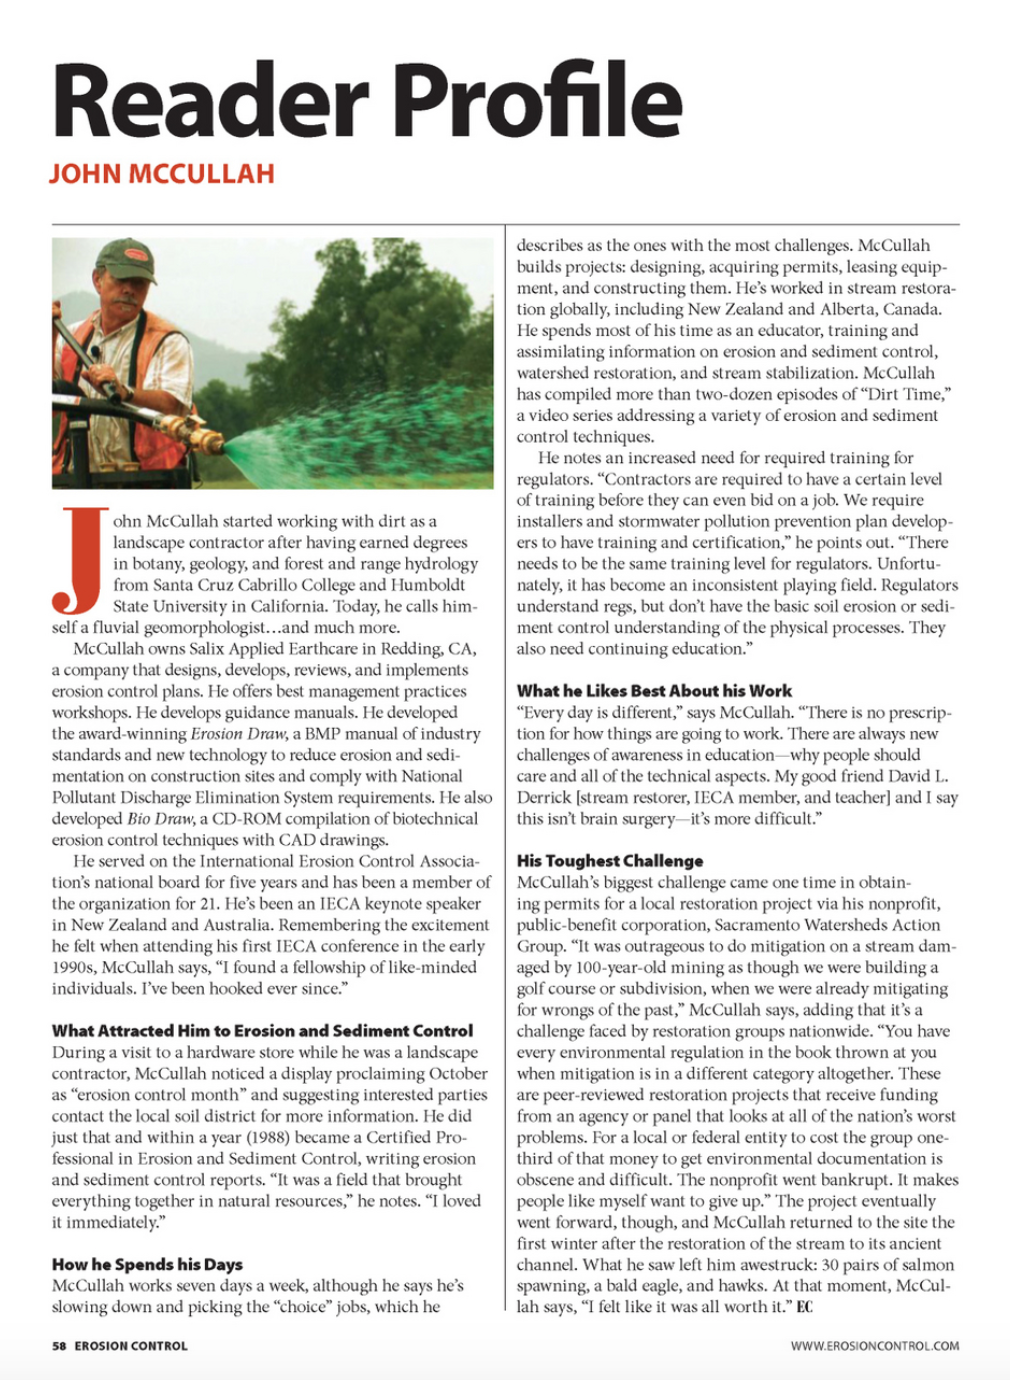 John McCullah Reader Profile from Erosioncontrol.com